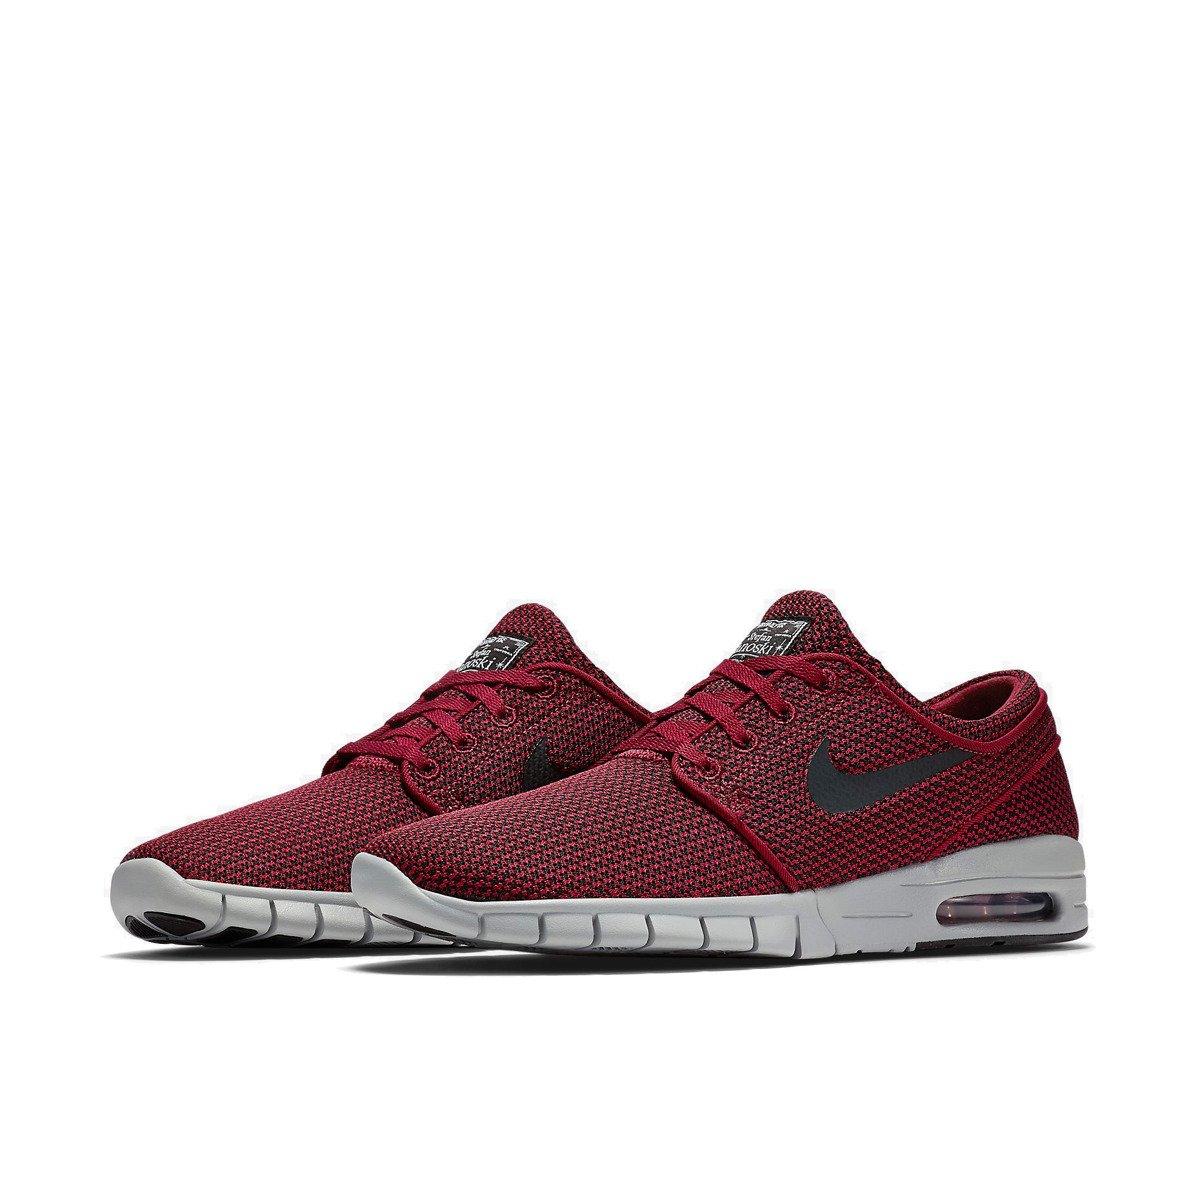 Nike SB Stefan Janoski Max Skate Shoes BlackWolf Grey